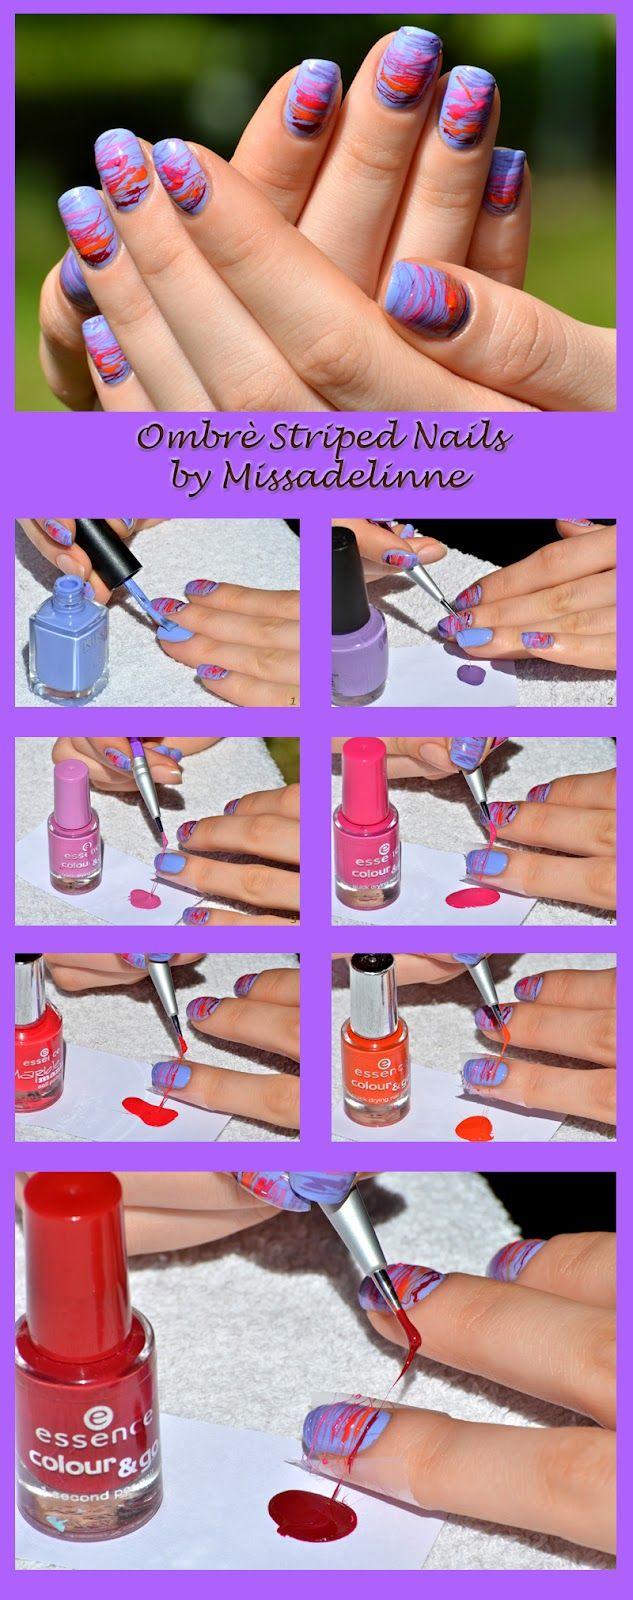 Ombrè Striped Nails: Ombre Stripes, Nails Nails, Nails Art, Ombré Stripes, Colour Nails, Stripes Nails, Ombrè Stripes, Step By Step, Art Tutorials